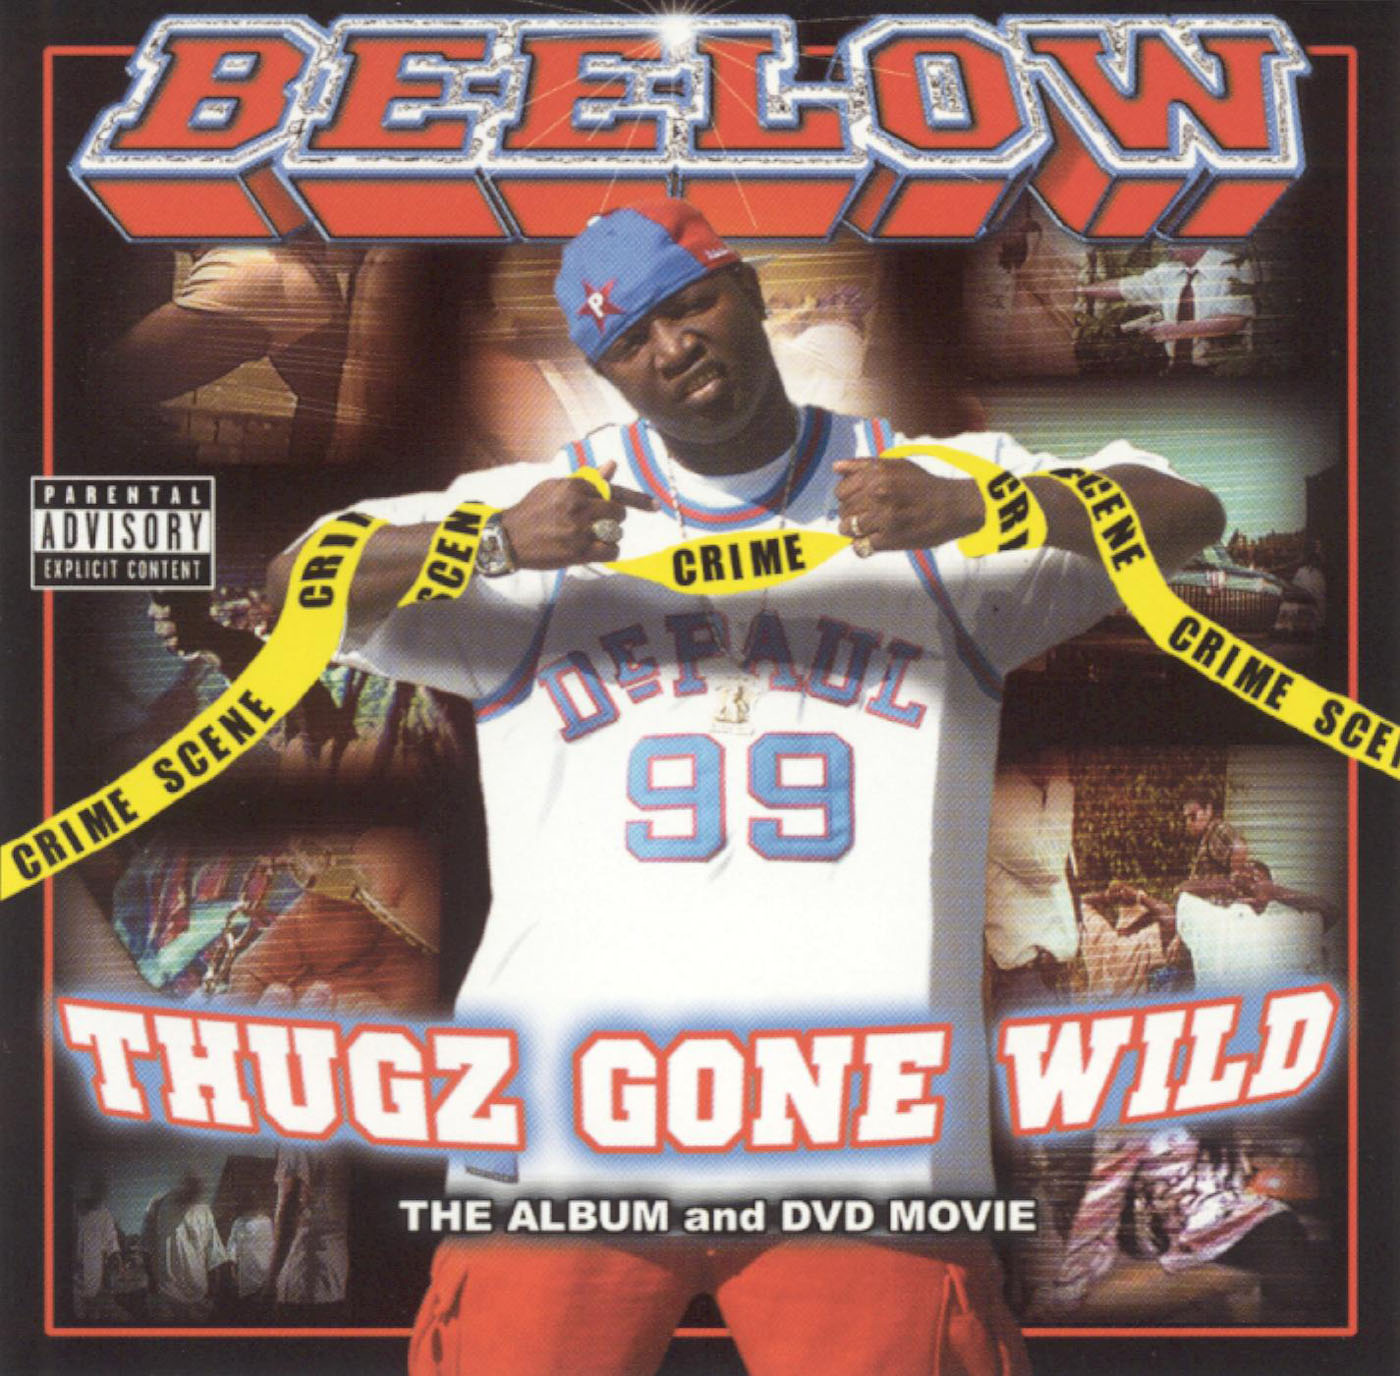 Beelow Presents...Thugz Gone Wild